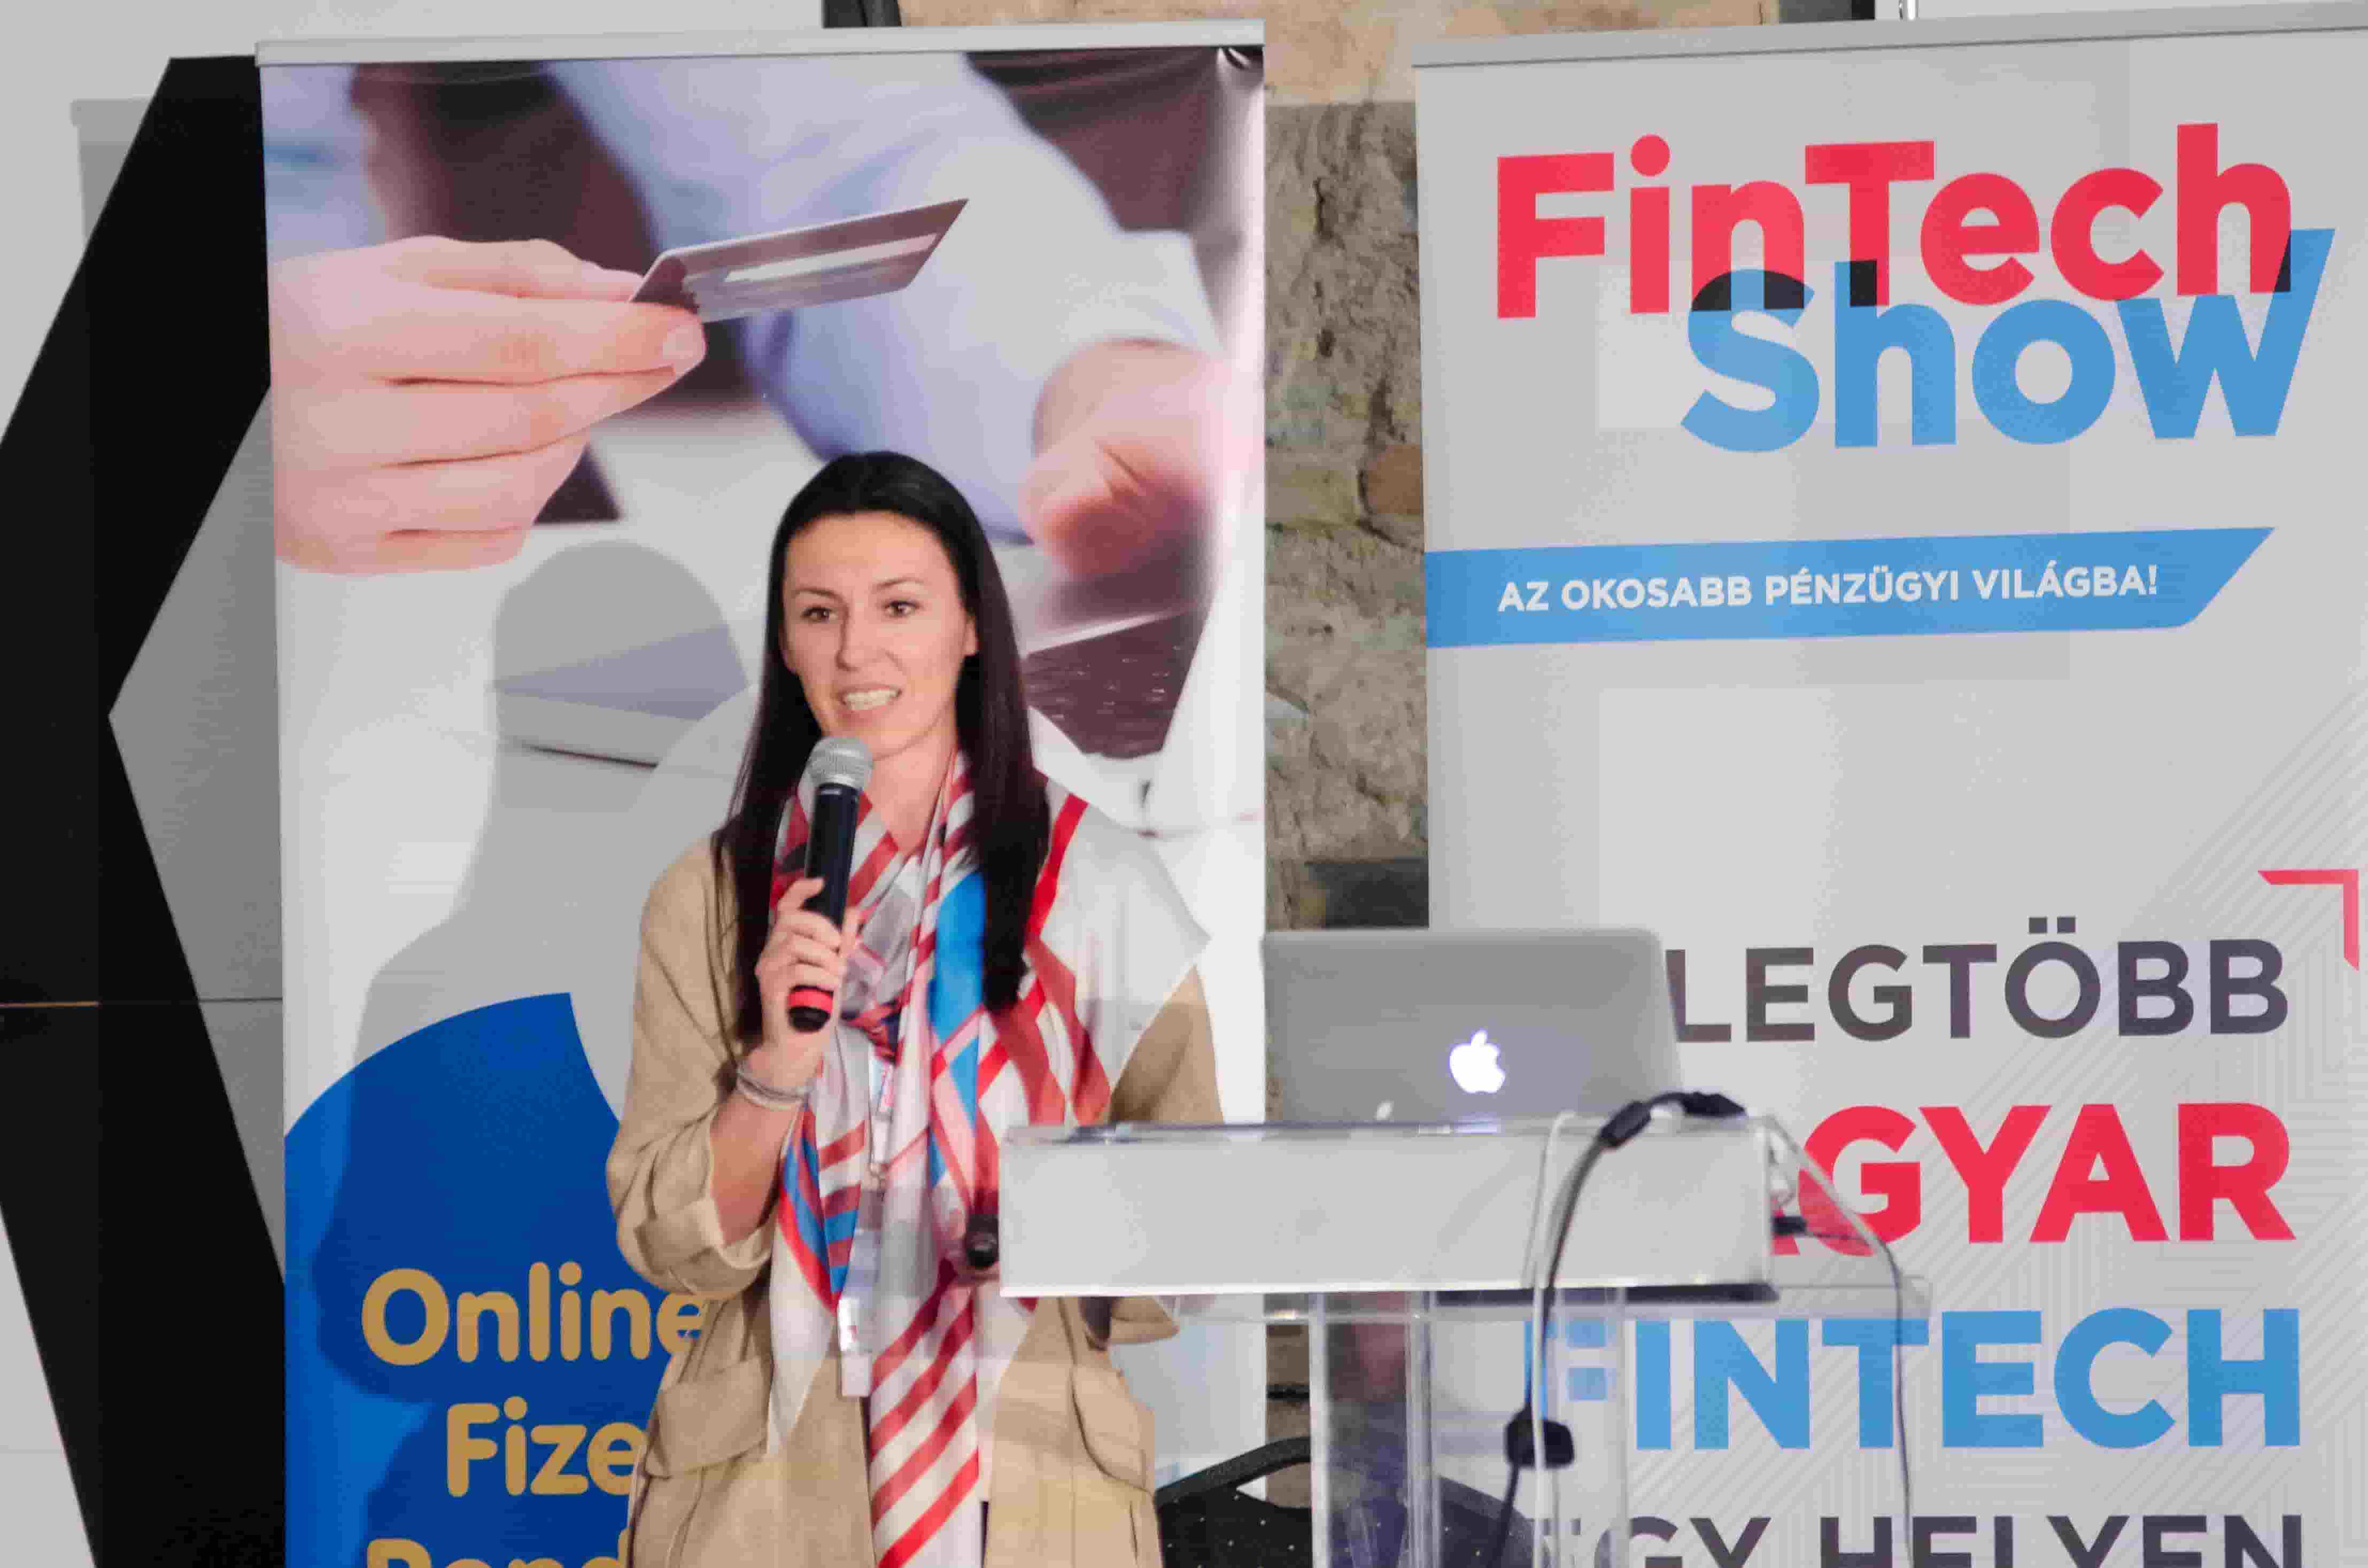 Petho Aniko FemTech Fintechshow